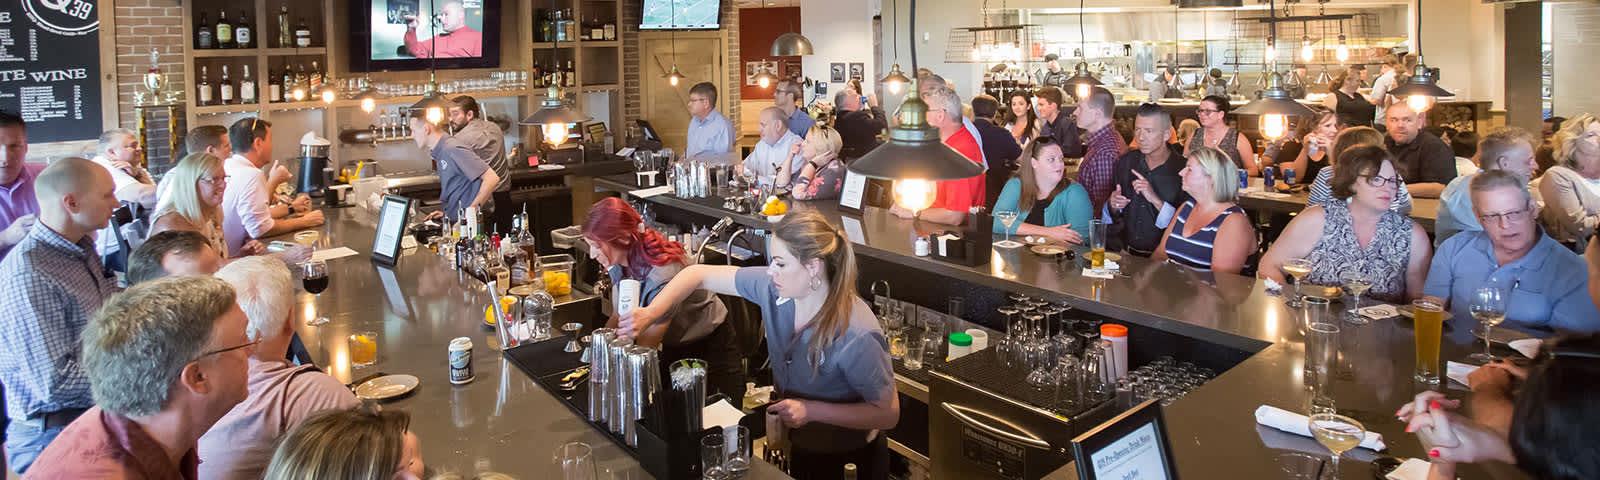 Bar-at-Q39-Overland-Park